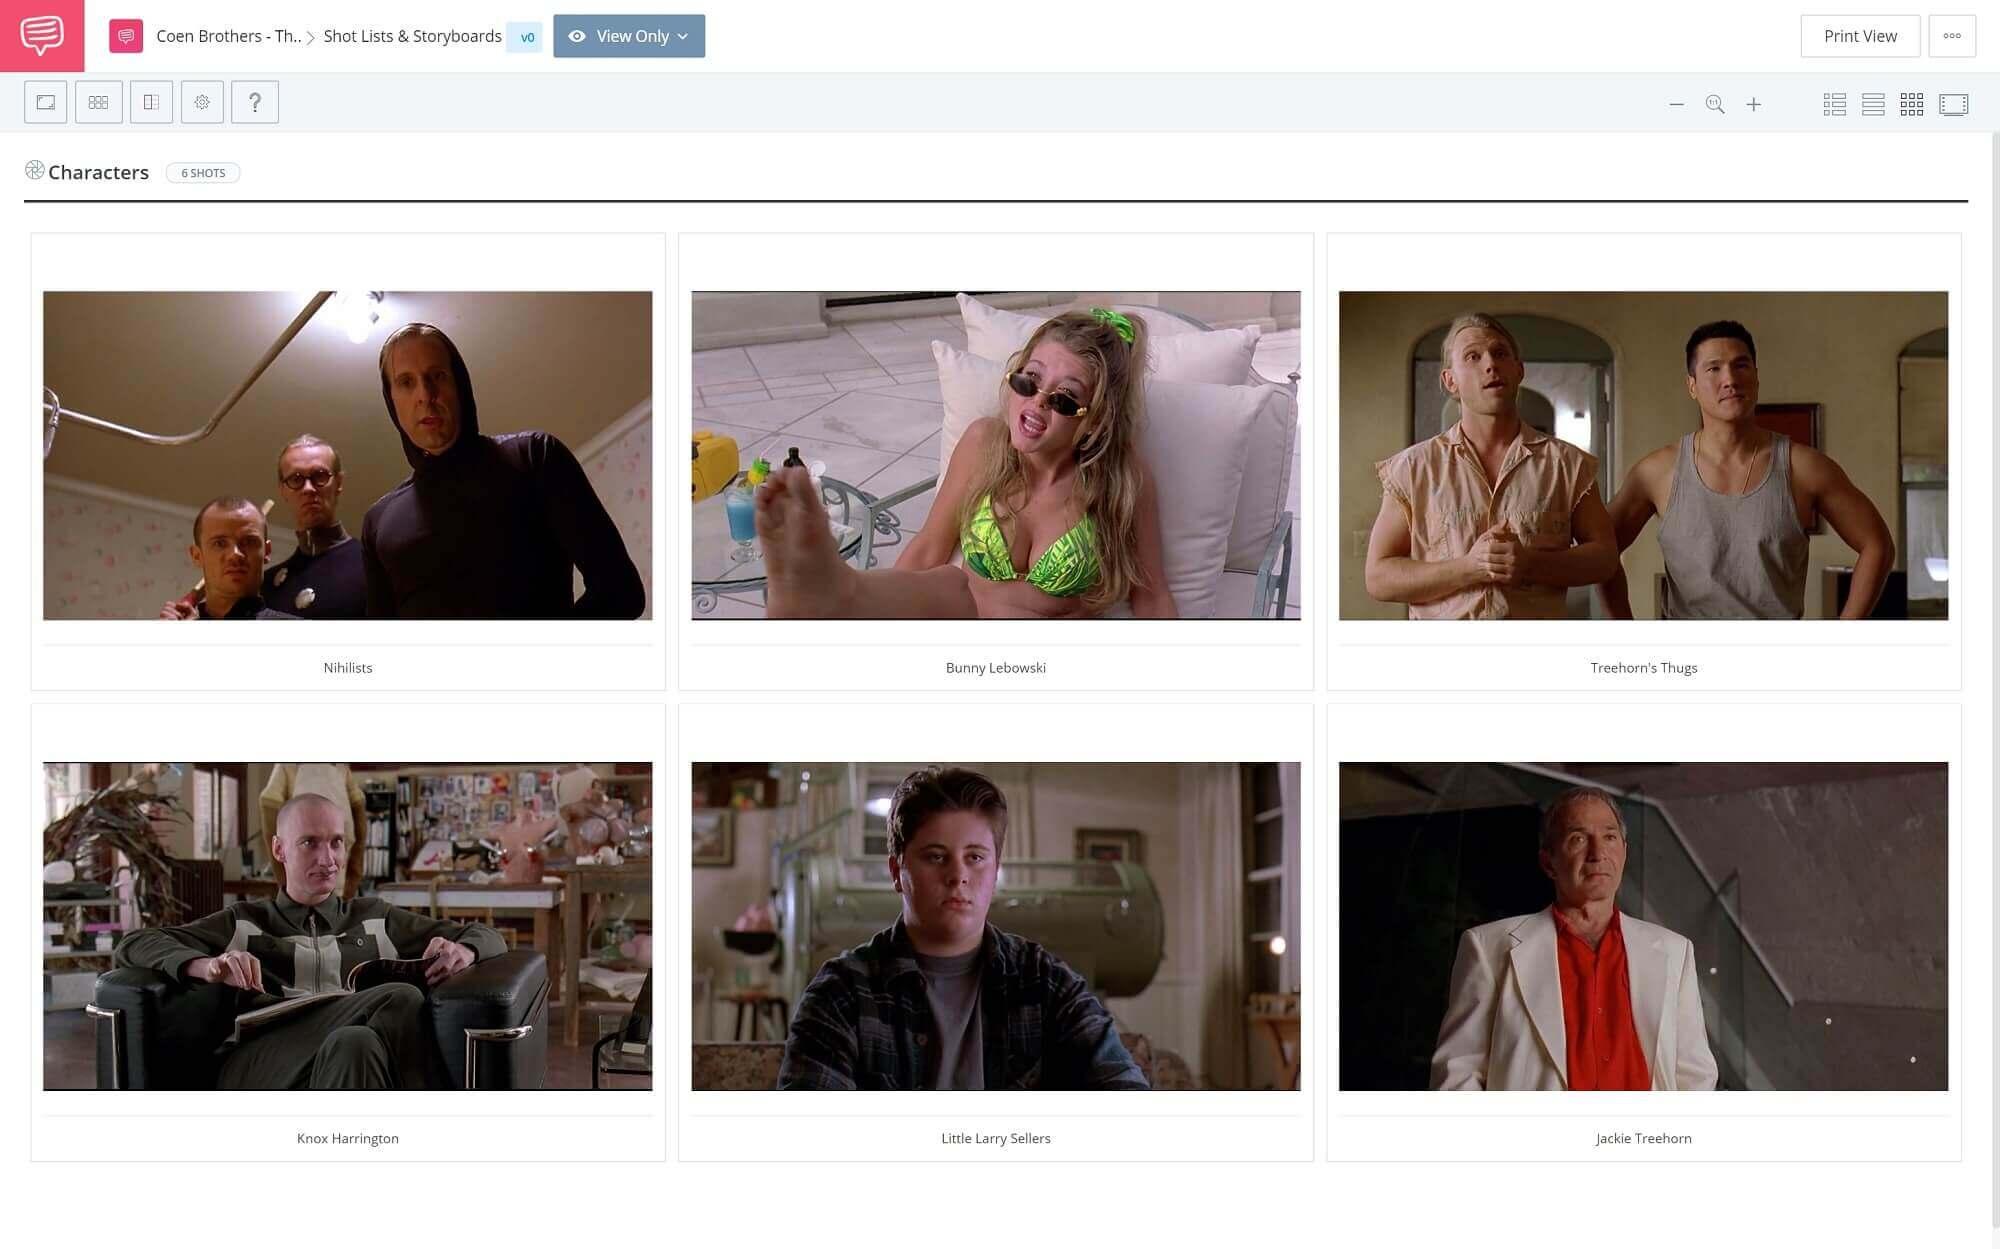 Best-Coen-Brothers-Movies-The-Big-Lebowski-Character-Shot-StudioBinder-Online-Storyboard-Software